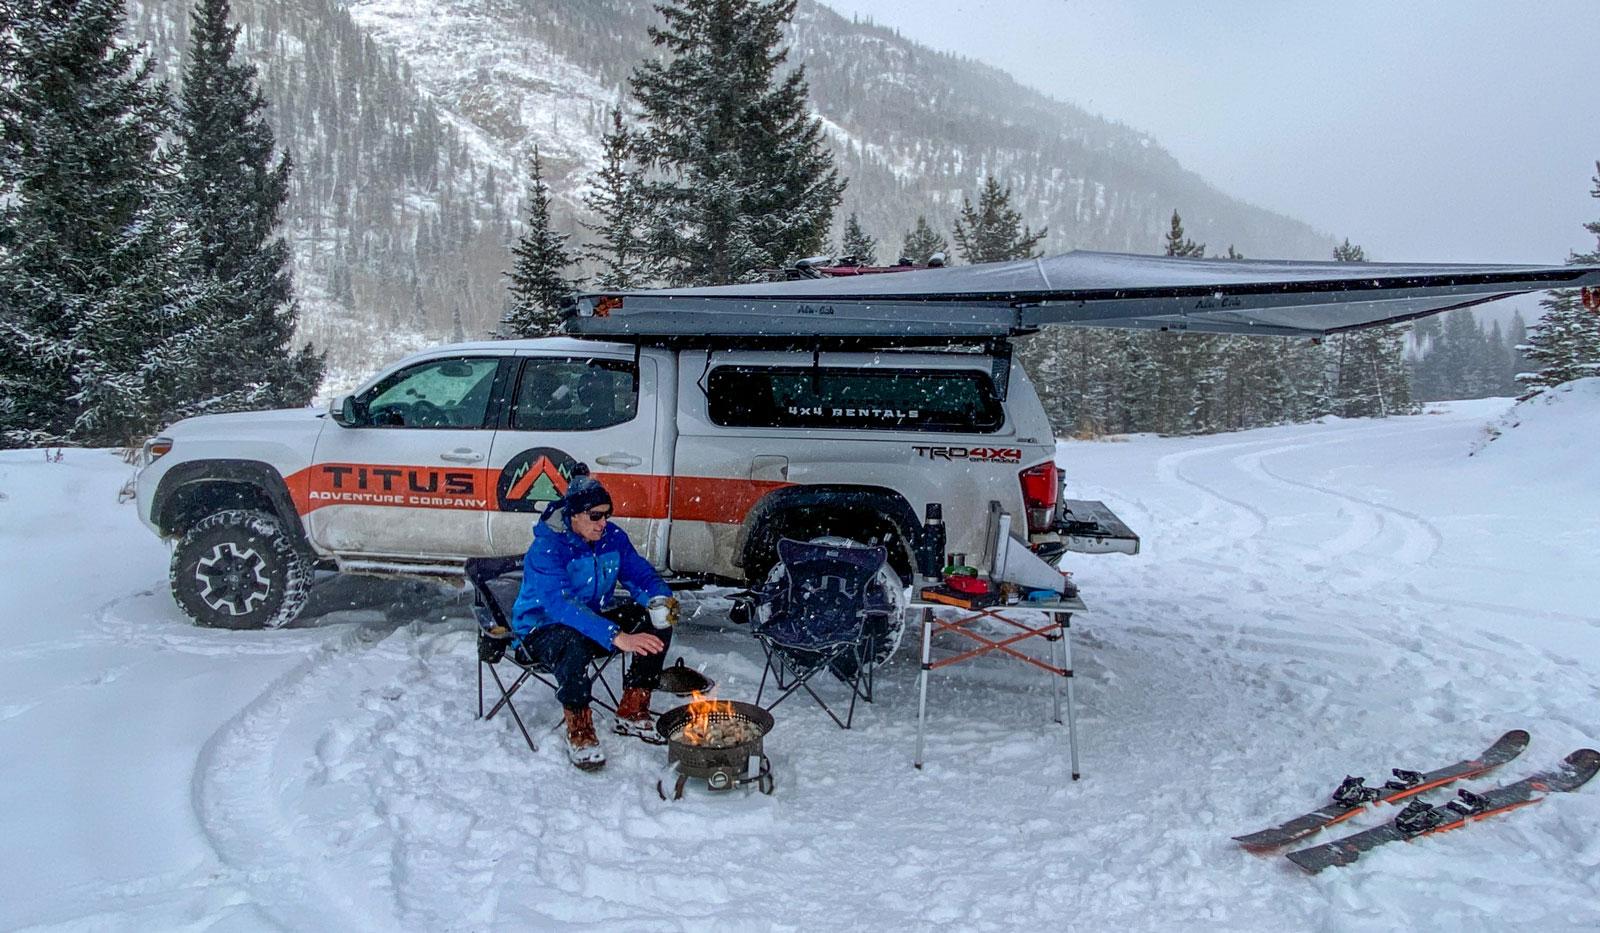 Titus mobile ski lodge